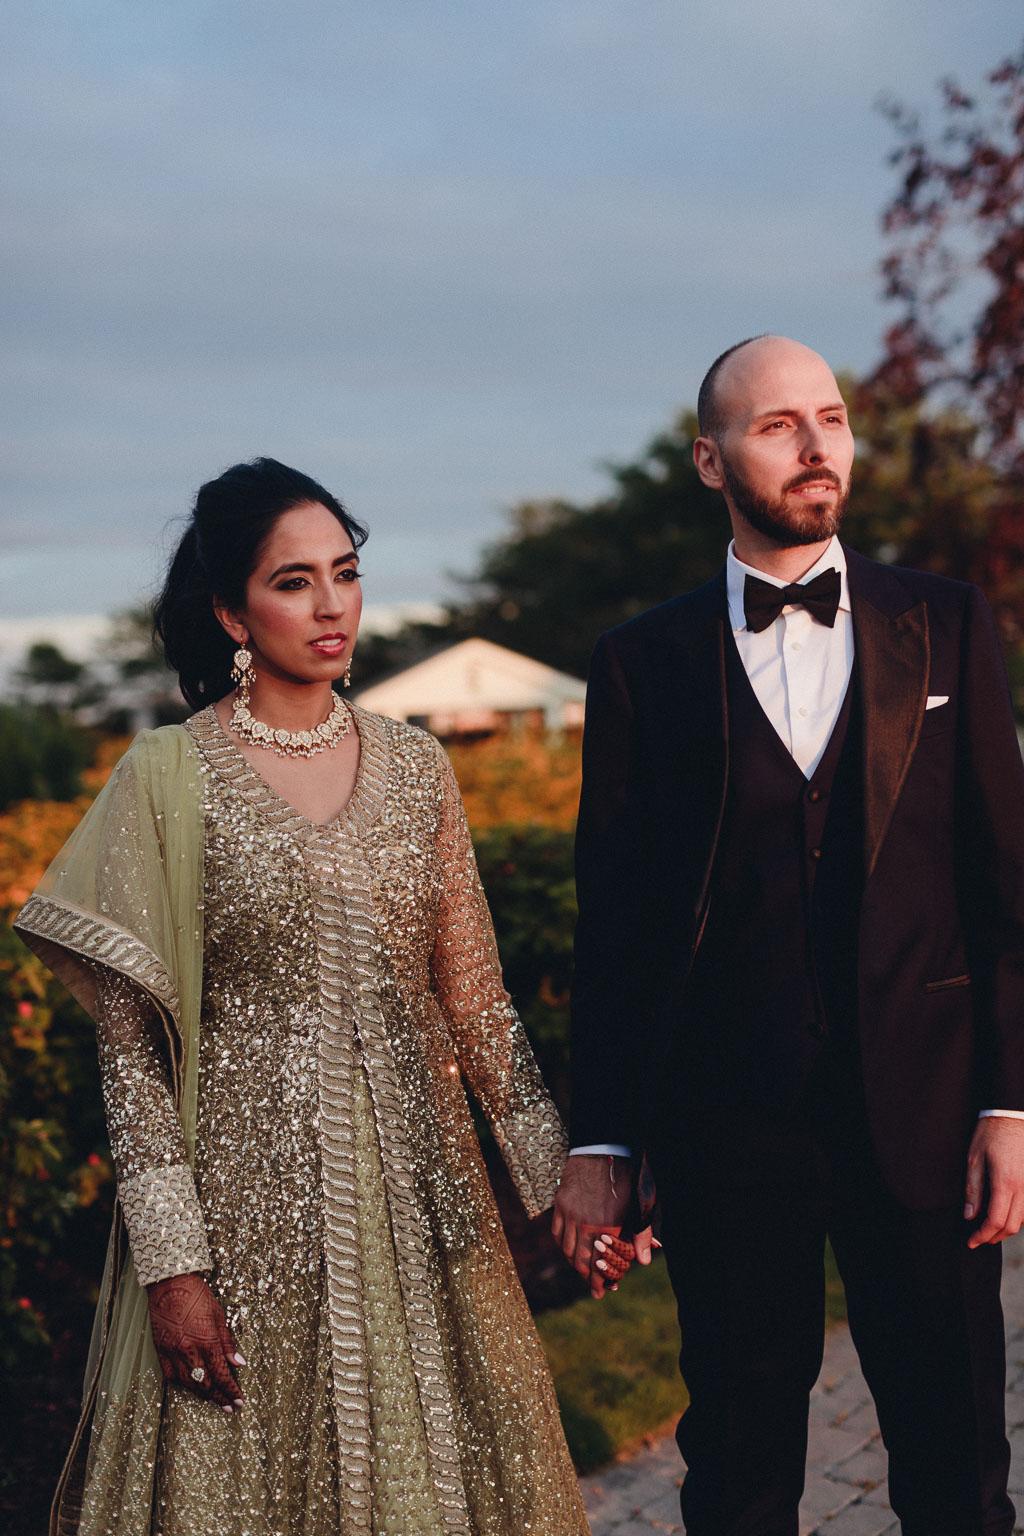 Toronto Indian Wedding by Toronto Wedding Photographer Evolylla Photography 0067.jpg